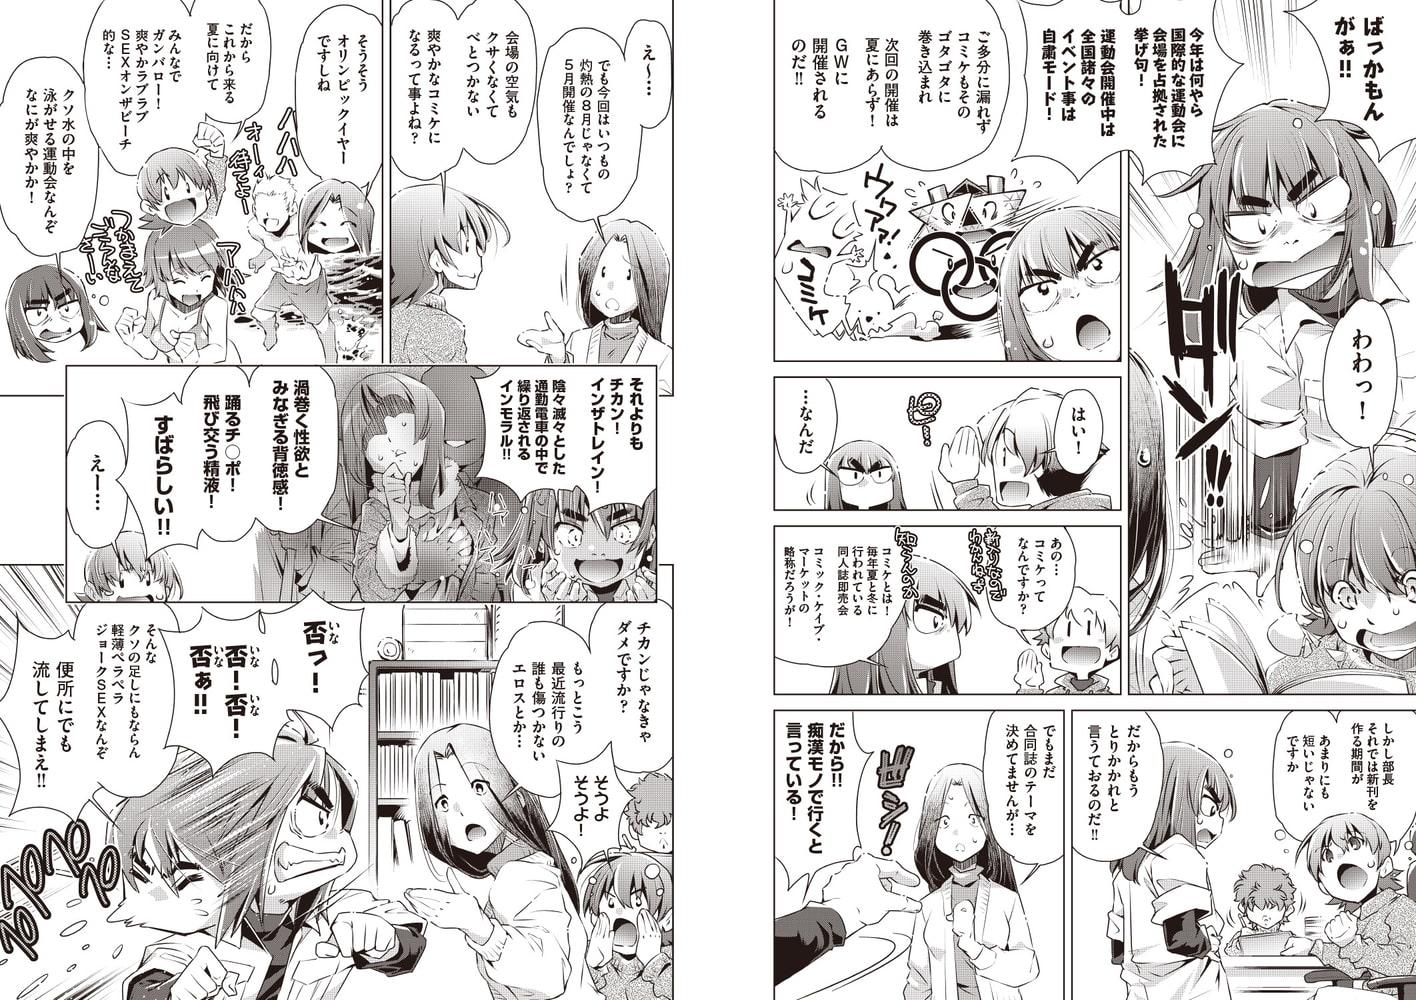 COMIC阿吽 改 Vol.7